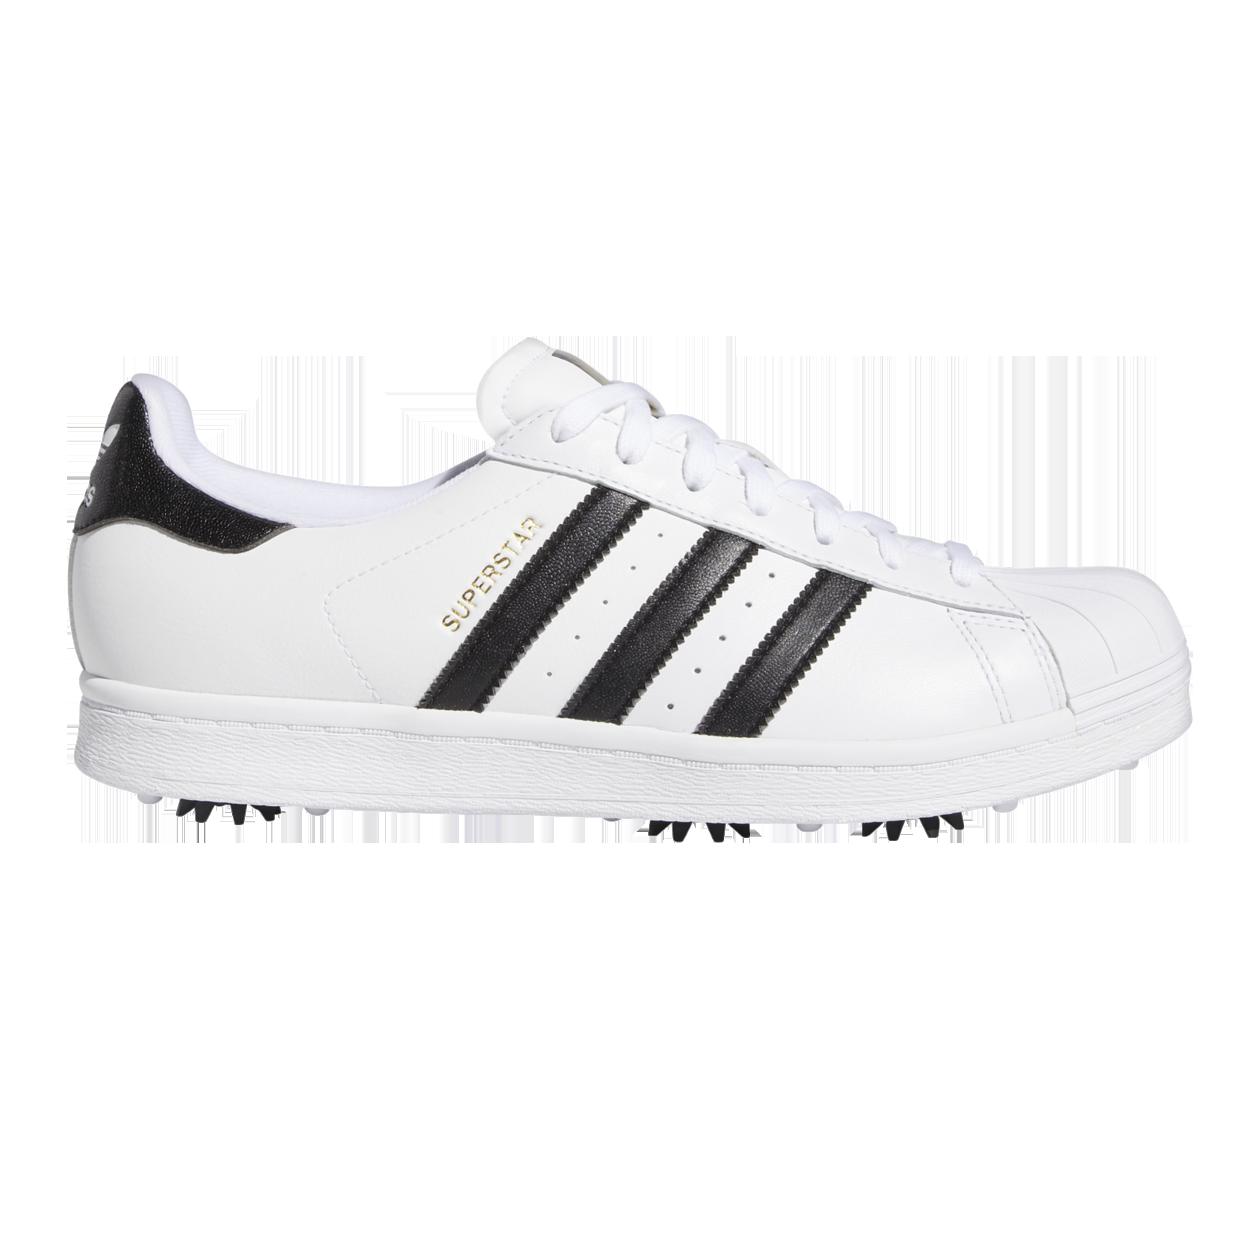 Adidas Superstar Men S Golf Shoe White Black Pga Tour Superstore